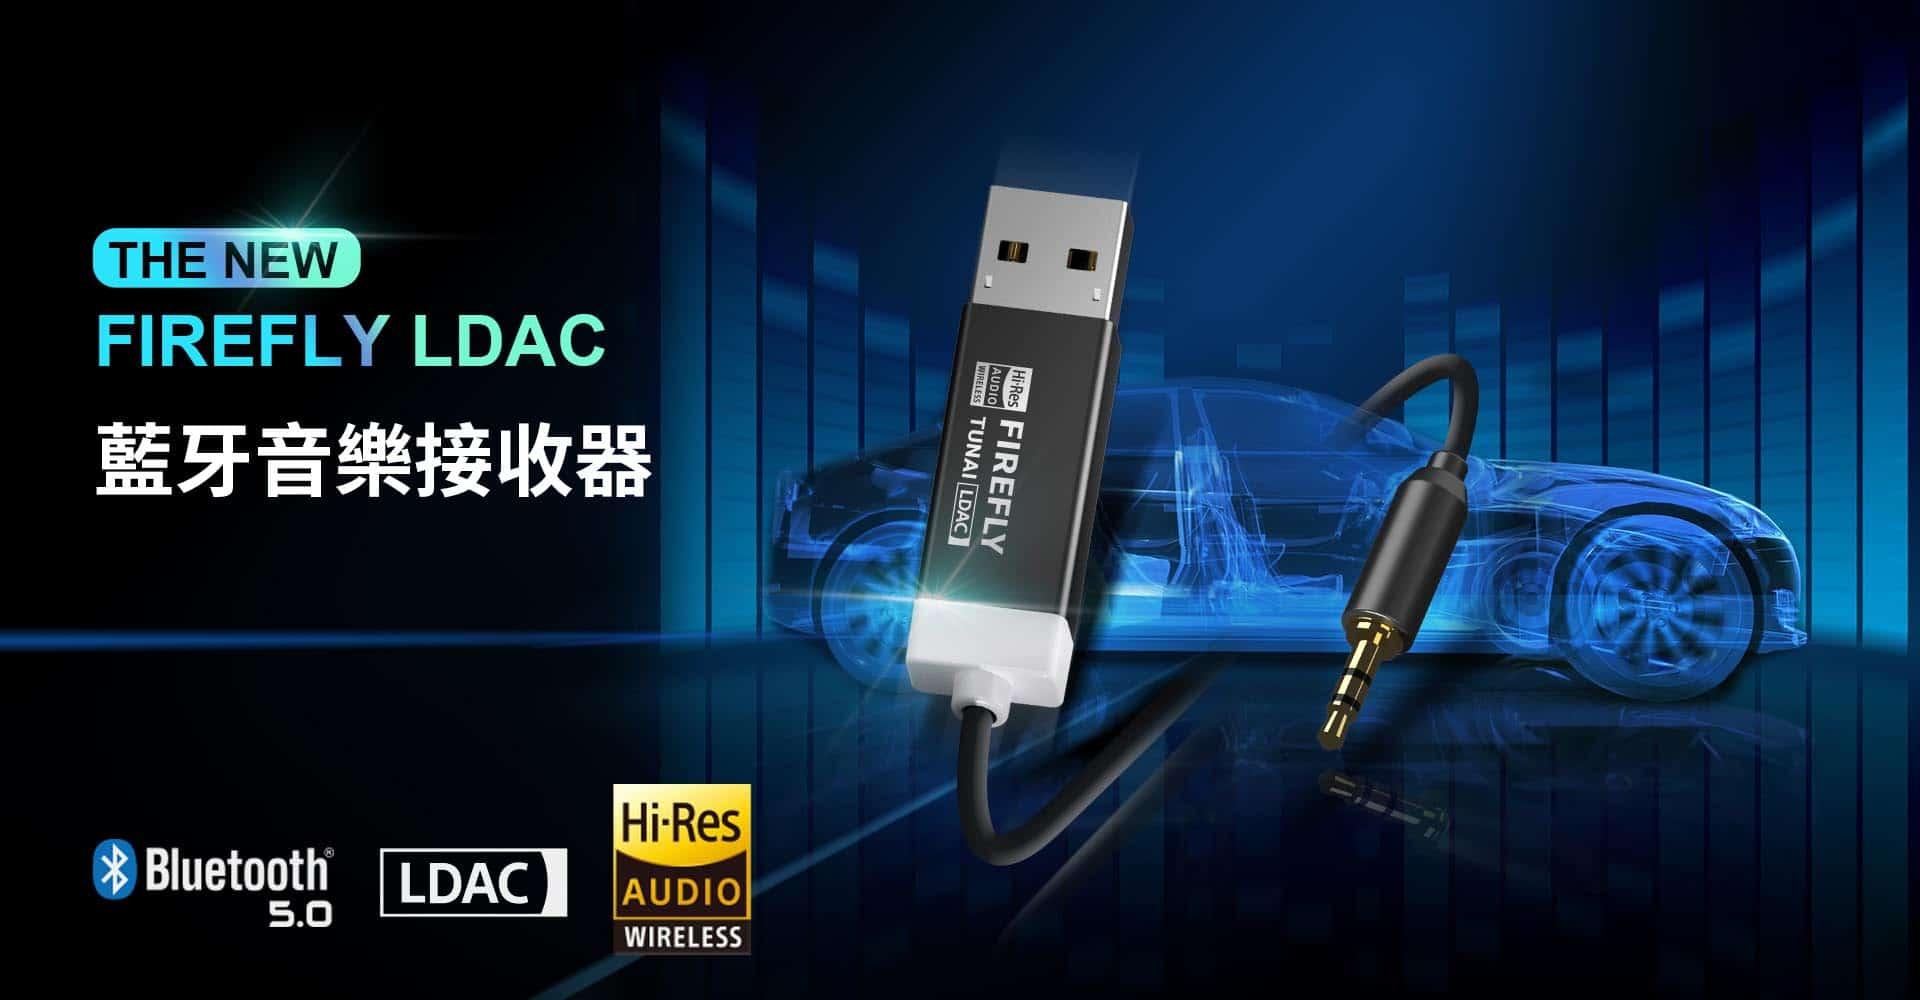 FIREFLY LDAC 藍芽(藍牙)接收器, 支援LDAC與獨立發燒DAC, 無噪音